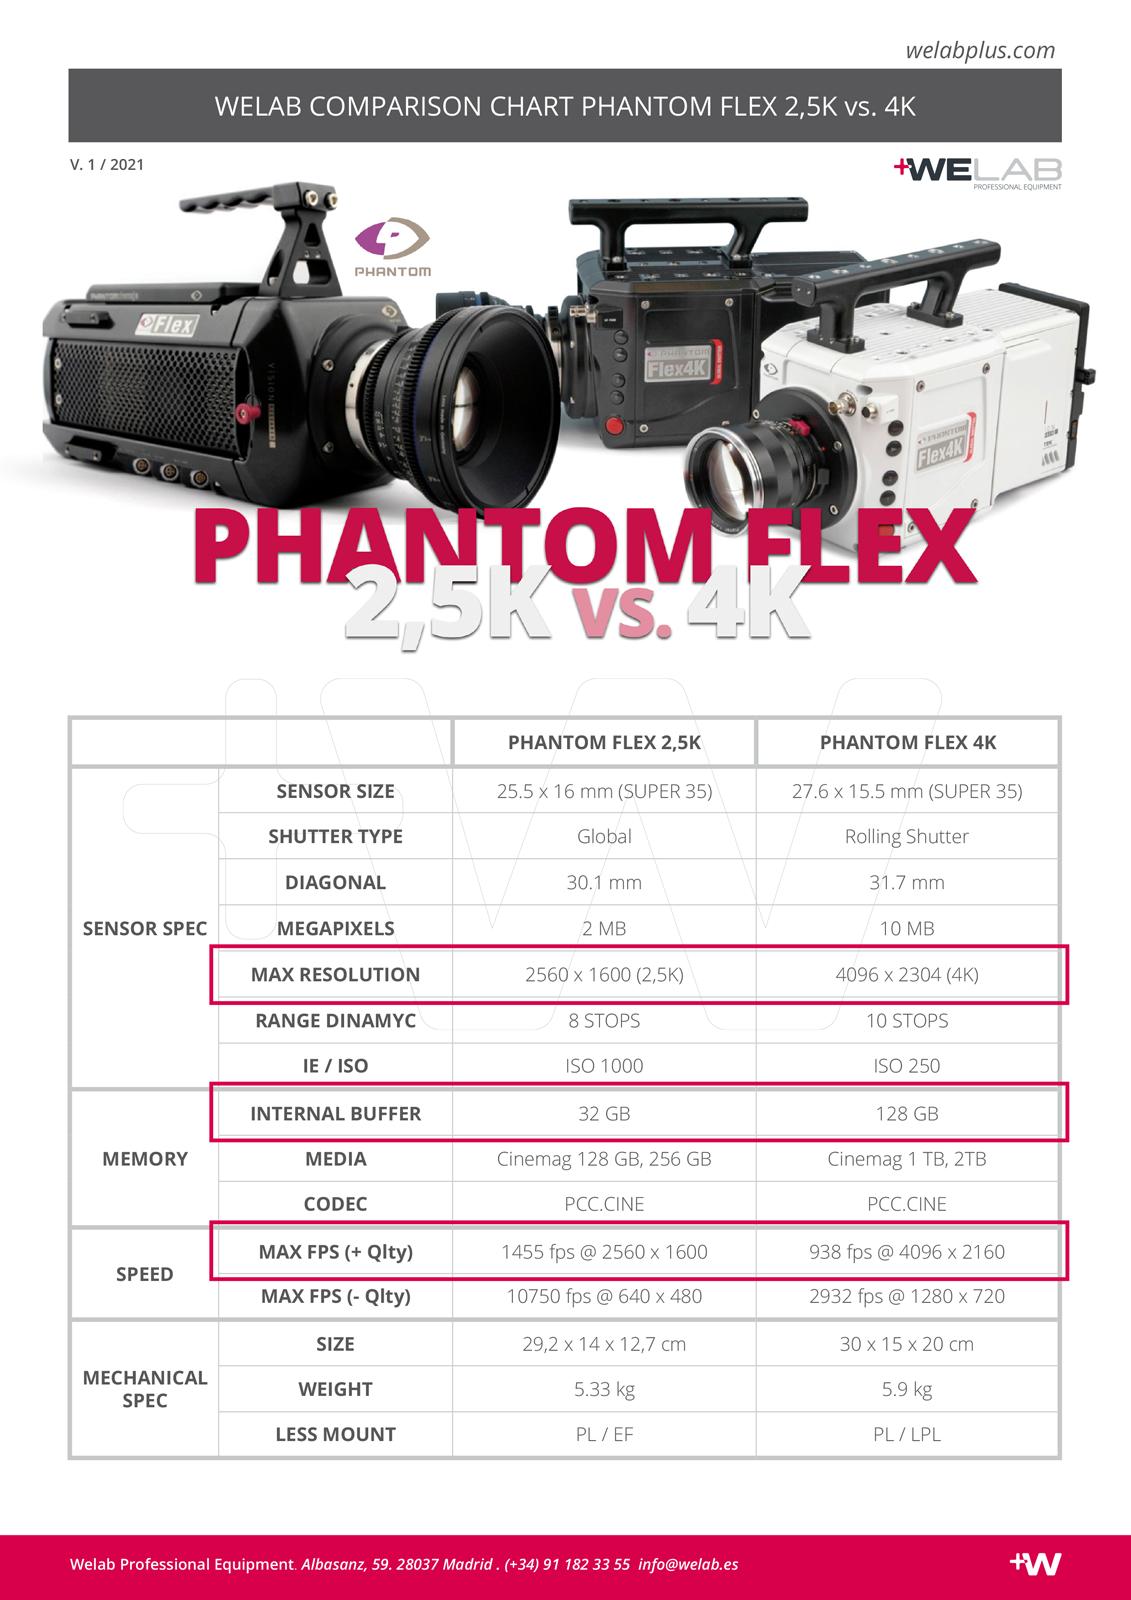 COMPARATIVA PHANTOM FLEX COMPARISON CHART WELAB PLUS